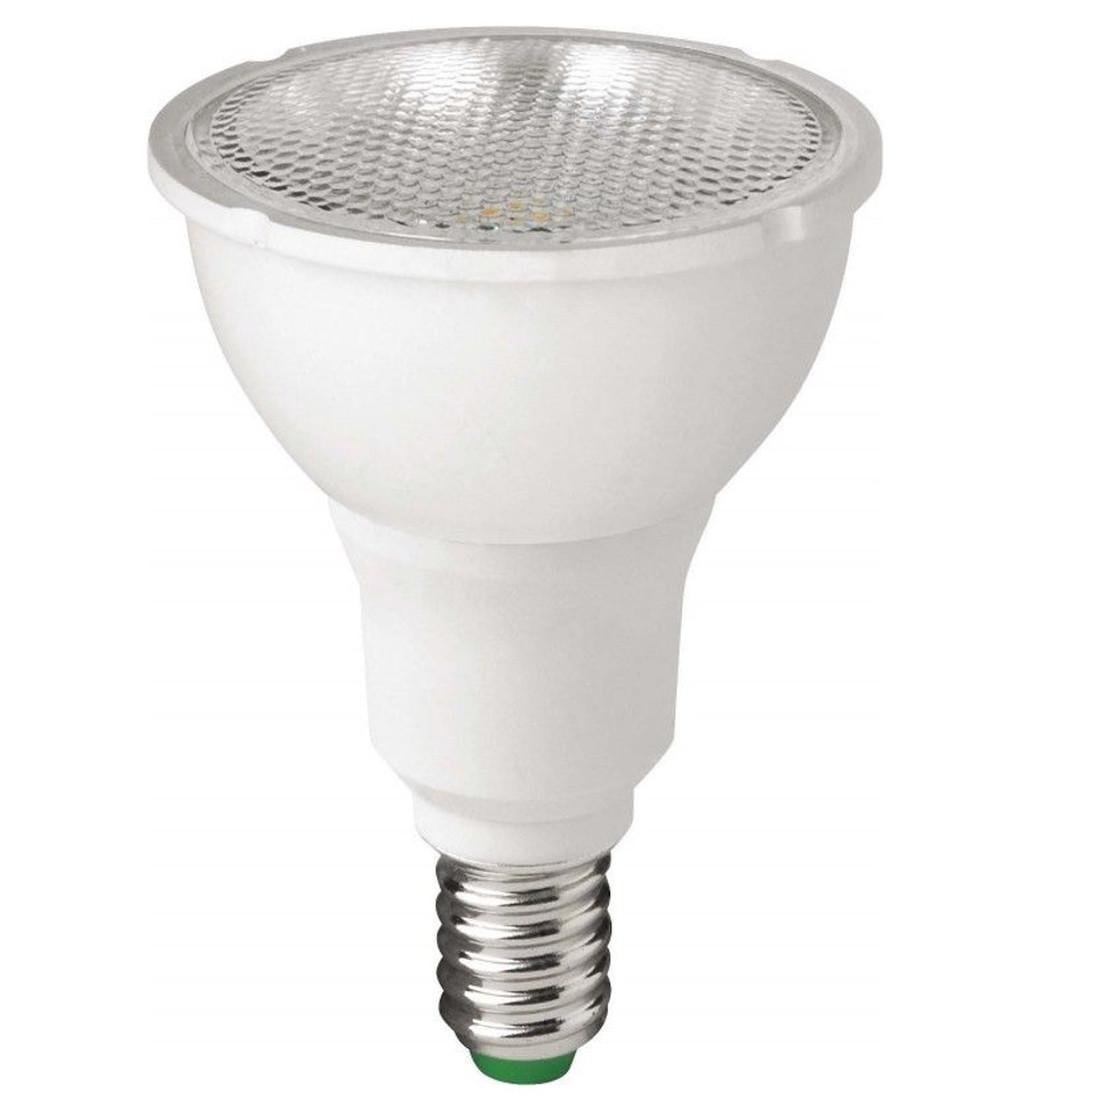 megaman mm26392 led reflektorlampe par16 35 4w e14 2800k warmwei 25 2 95. Black Bedroom Furniture Sets. Home Design Ideas